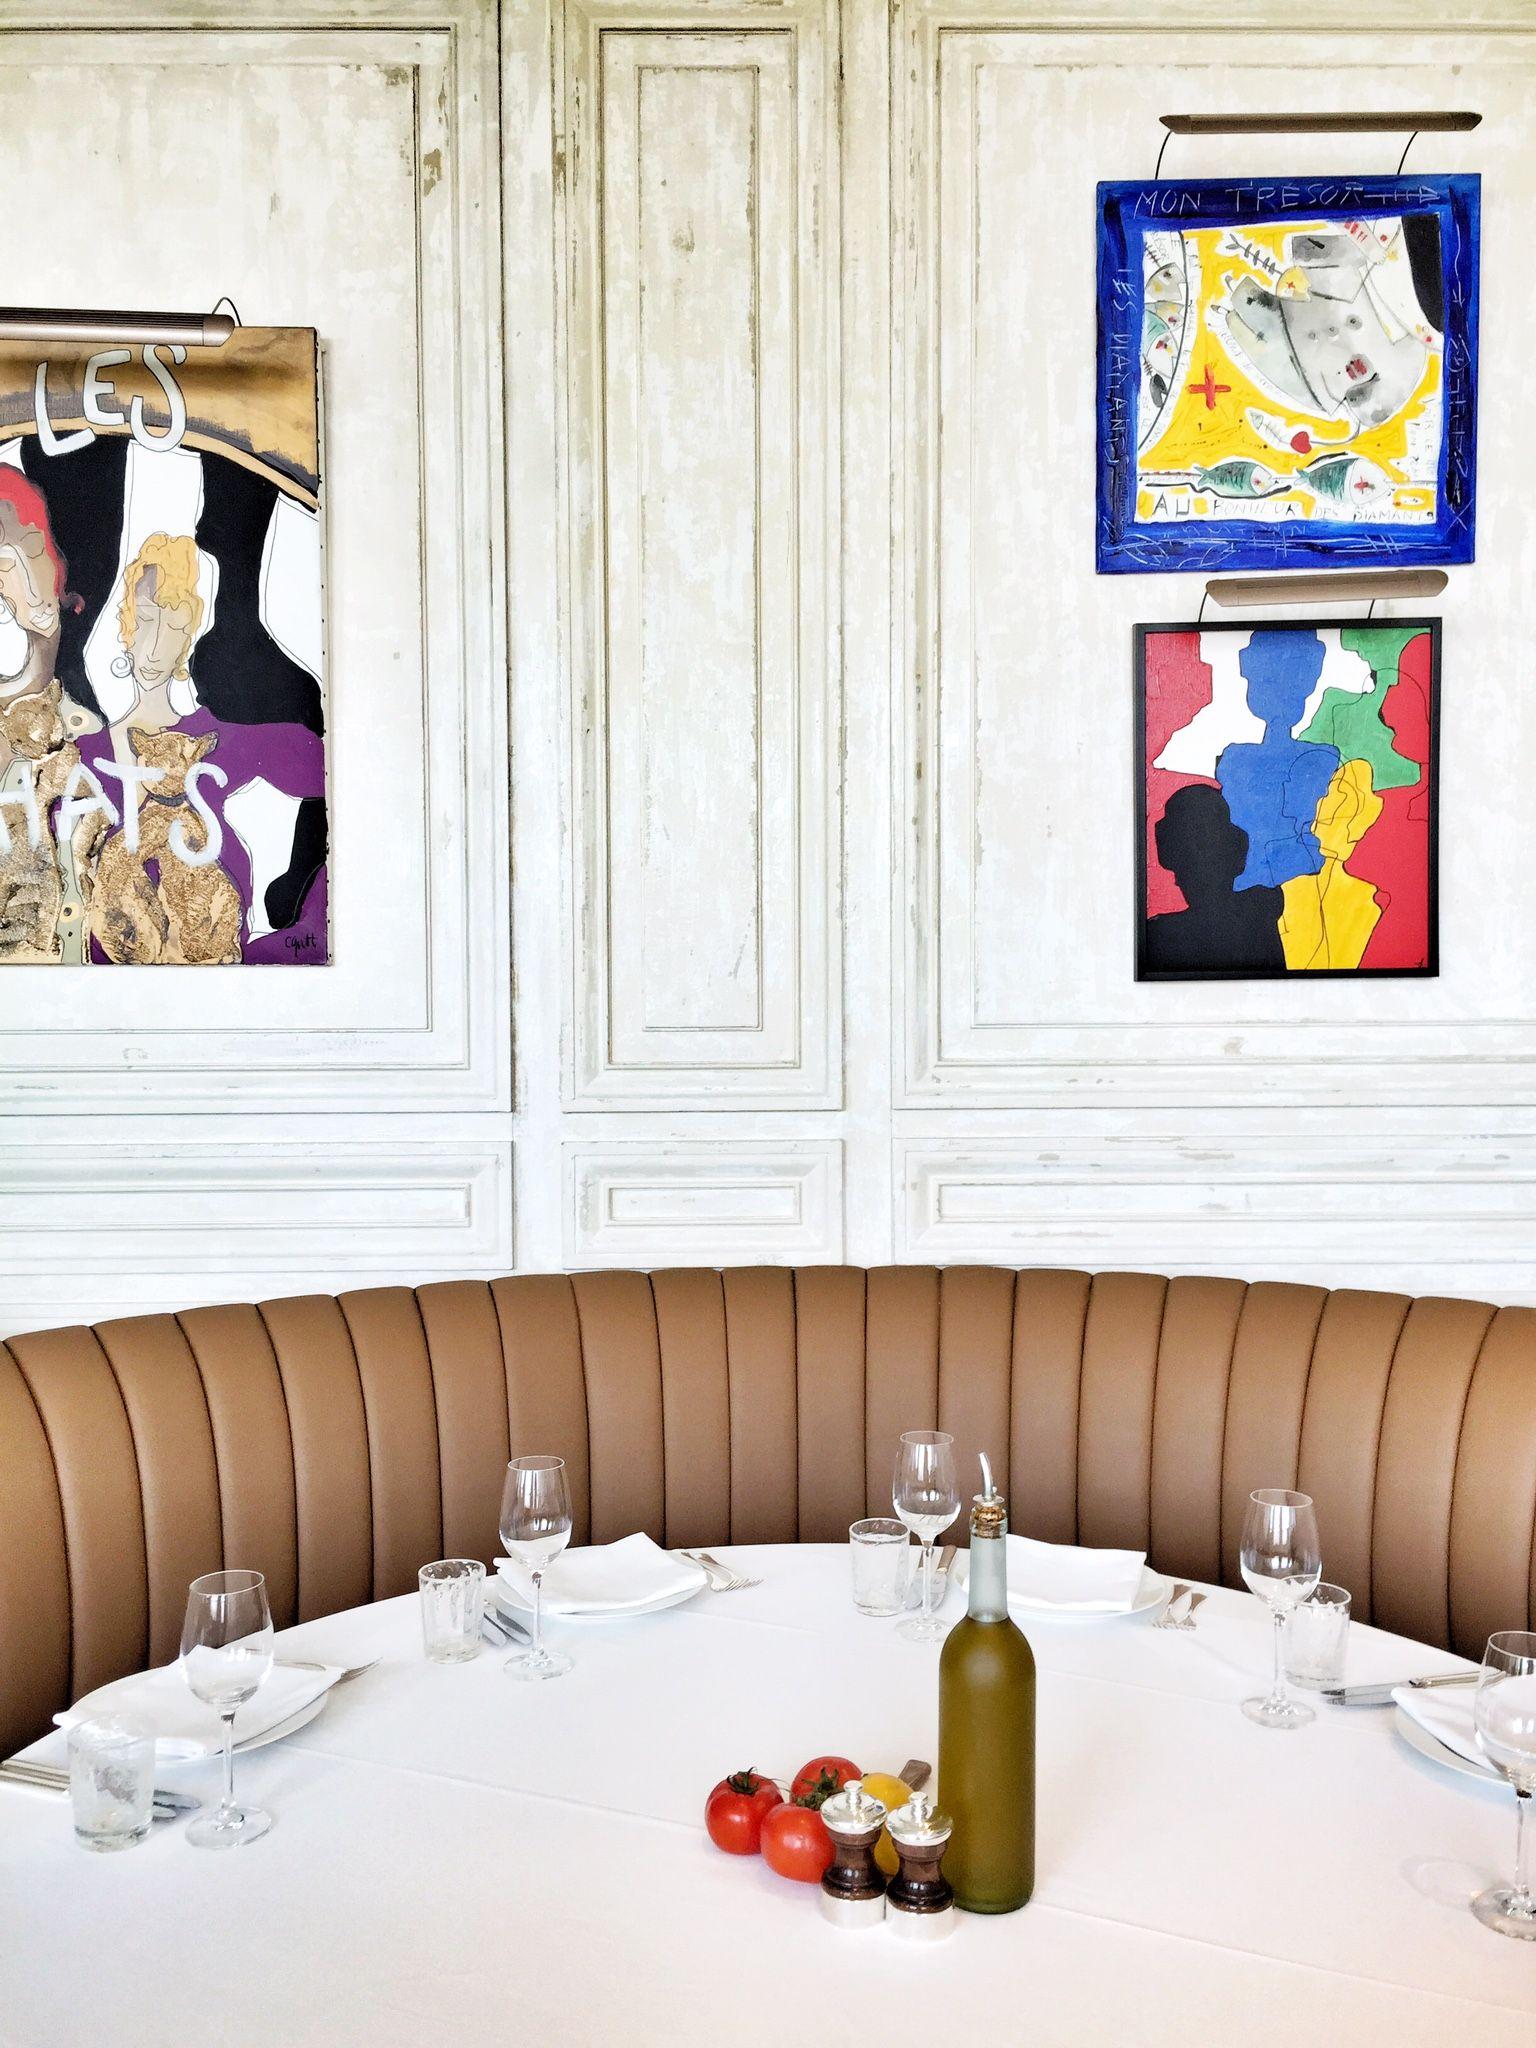 La Petite Maison - Dubai | Thefoodalist.com | Bar / Restaurant ...